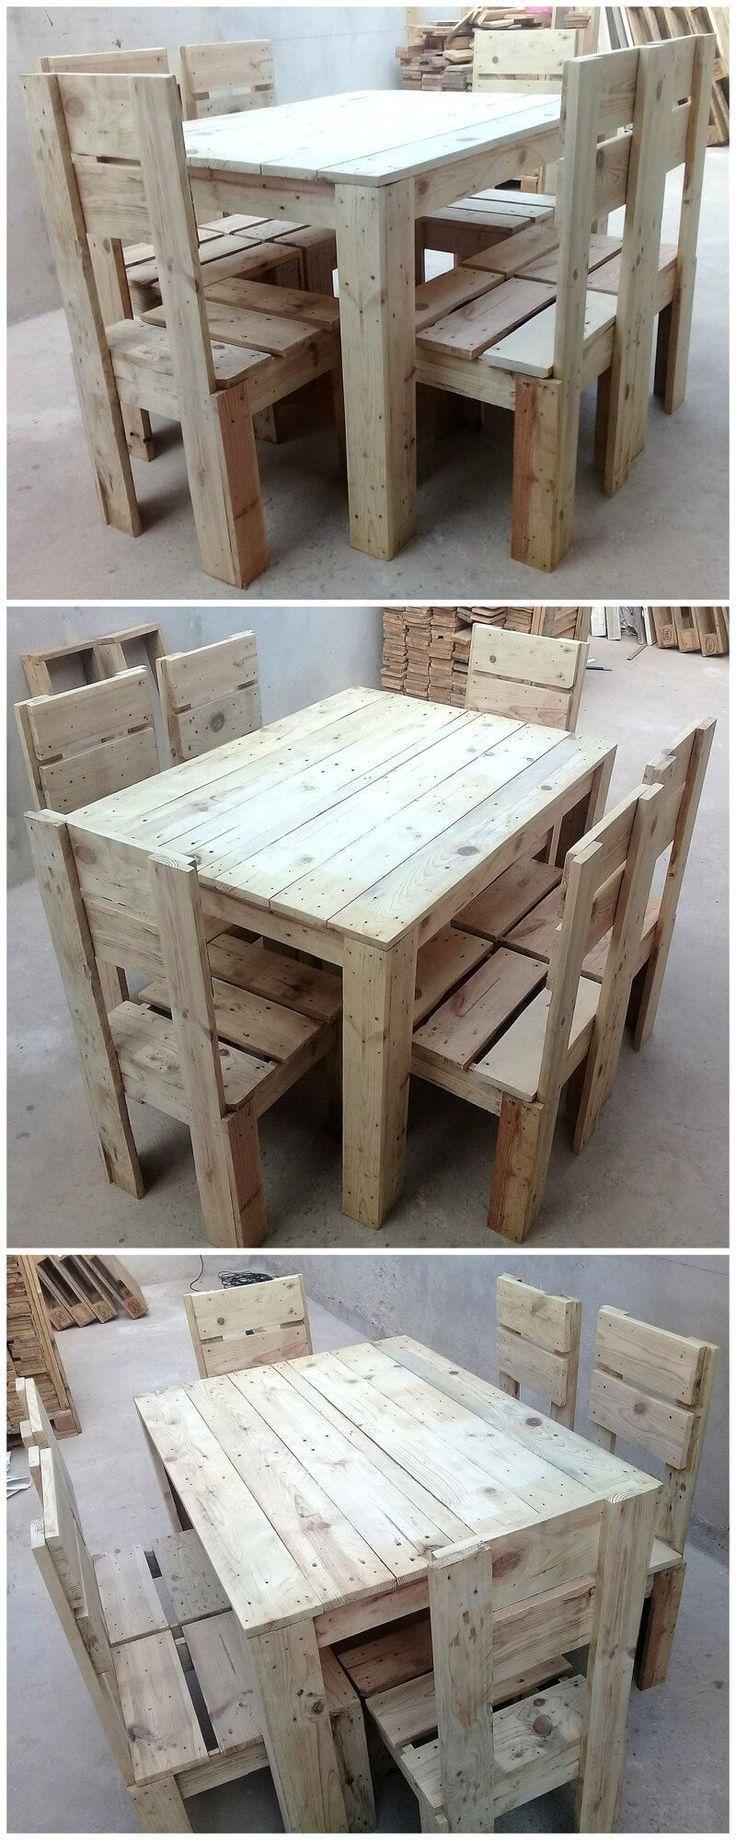 Original Diy Ideas For Wooden Pallets Recycling Wood Pallet Furniture Wood Pallet Furniture Pallet Furniture Wood Pallets